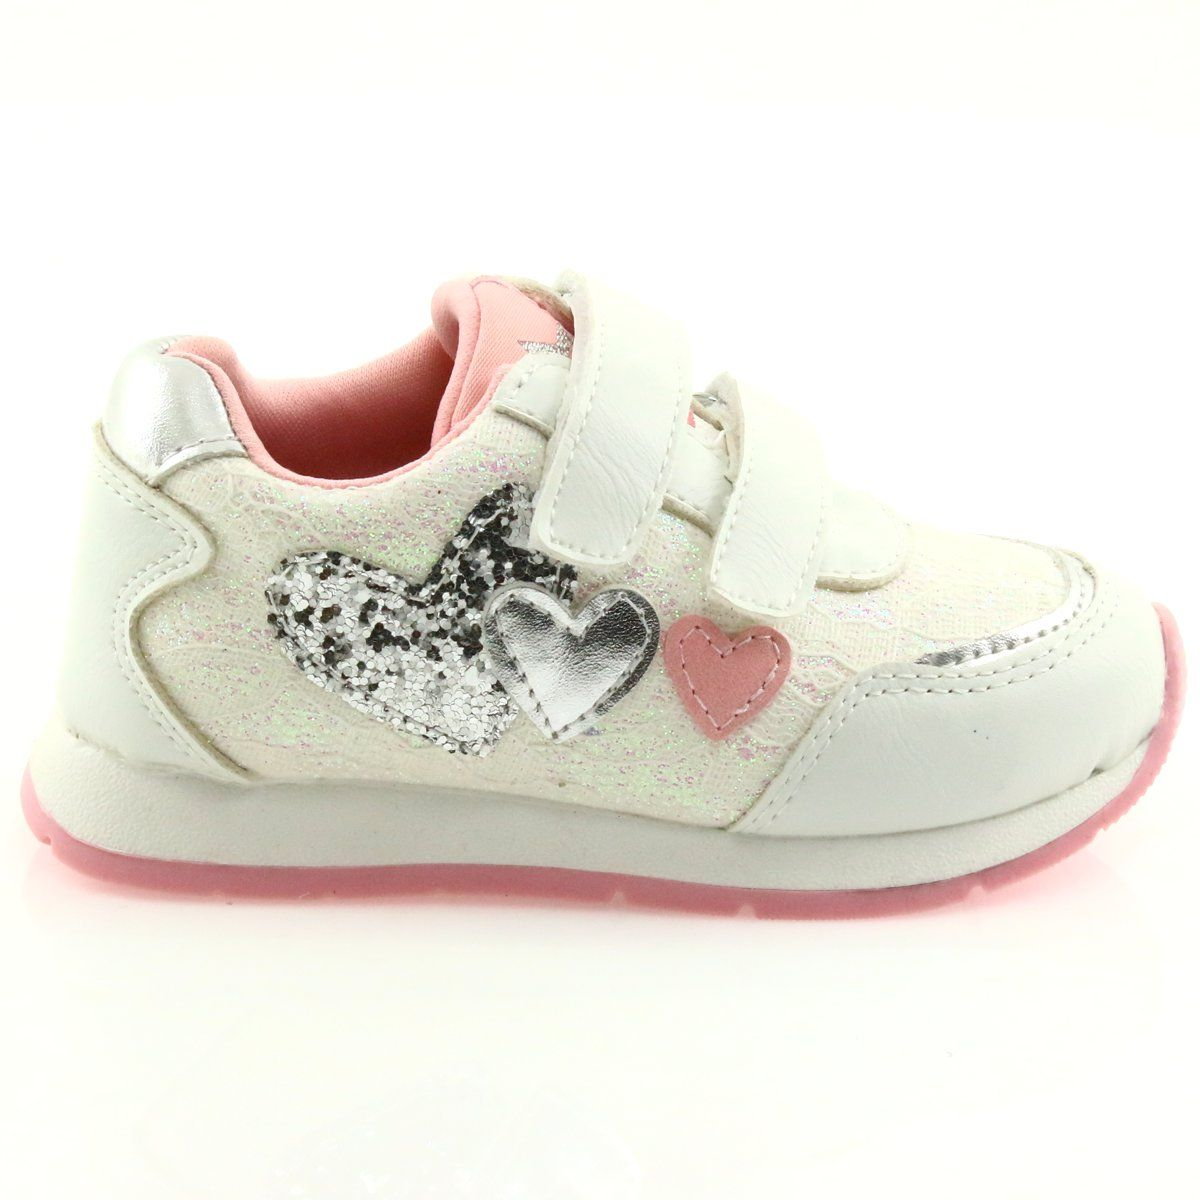 Buty Sportowe Wkladka Skora American Club Gc11 Biale Szare Rozowe Shoe Inserts Shoes Leather